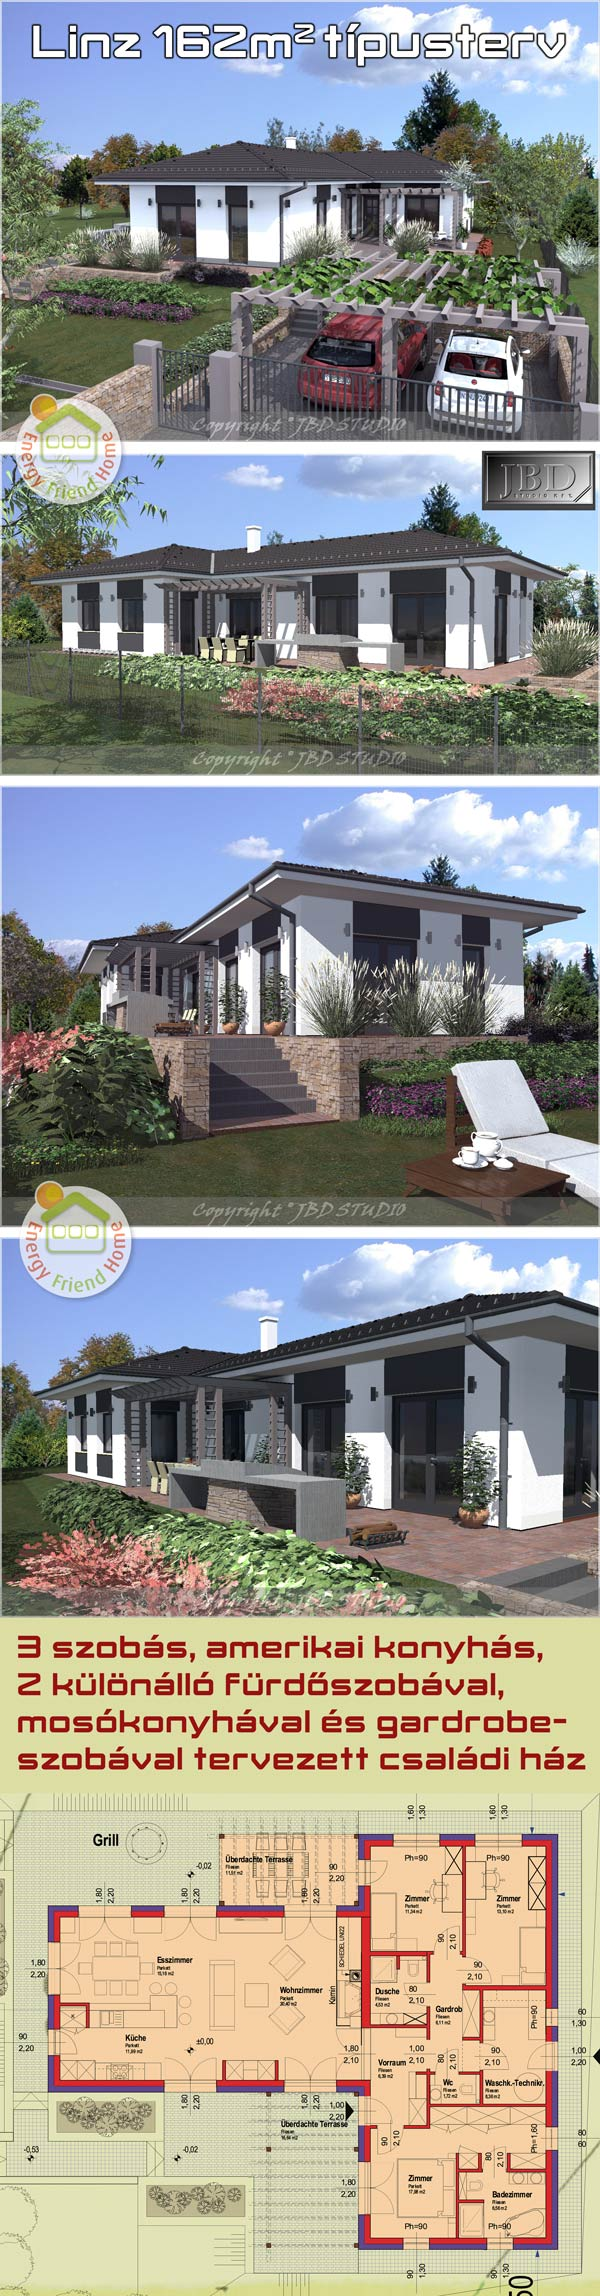 Linz162-típusterv-családi-ház